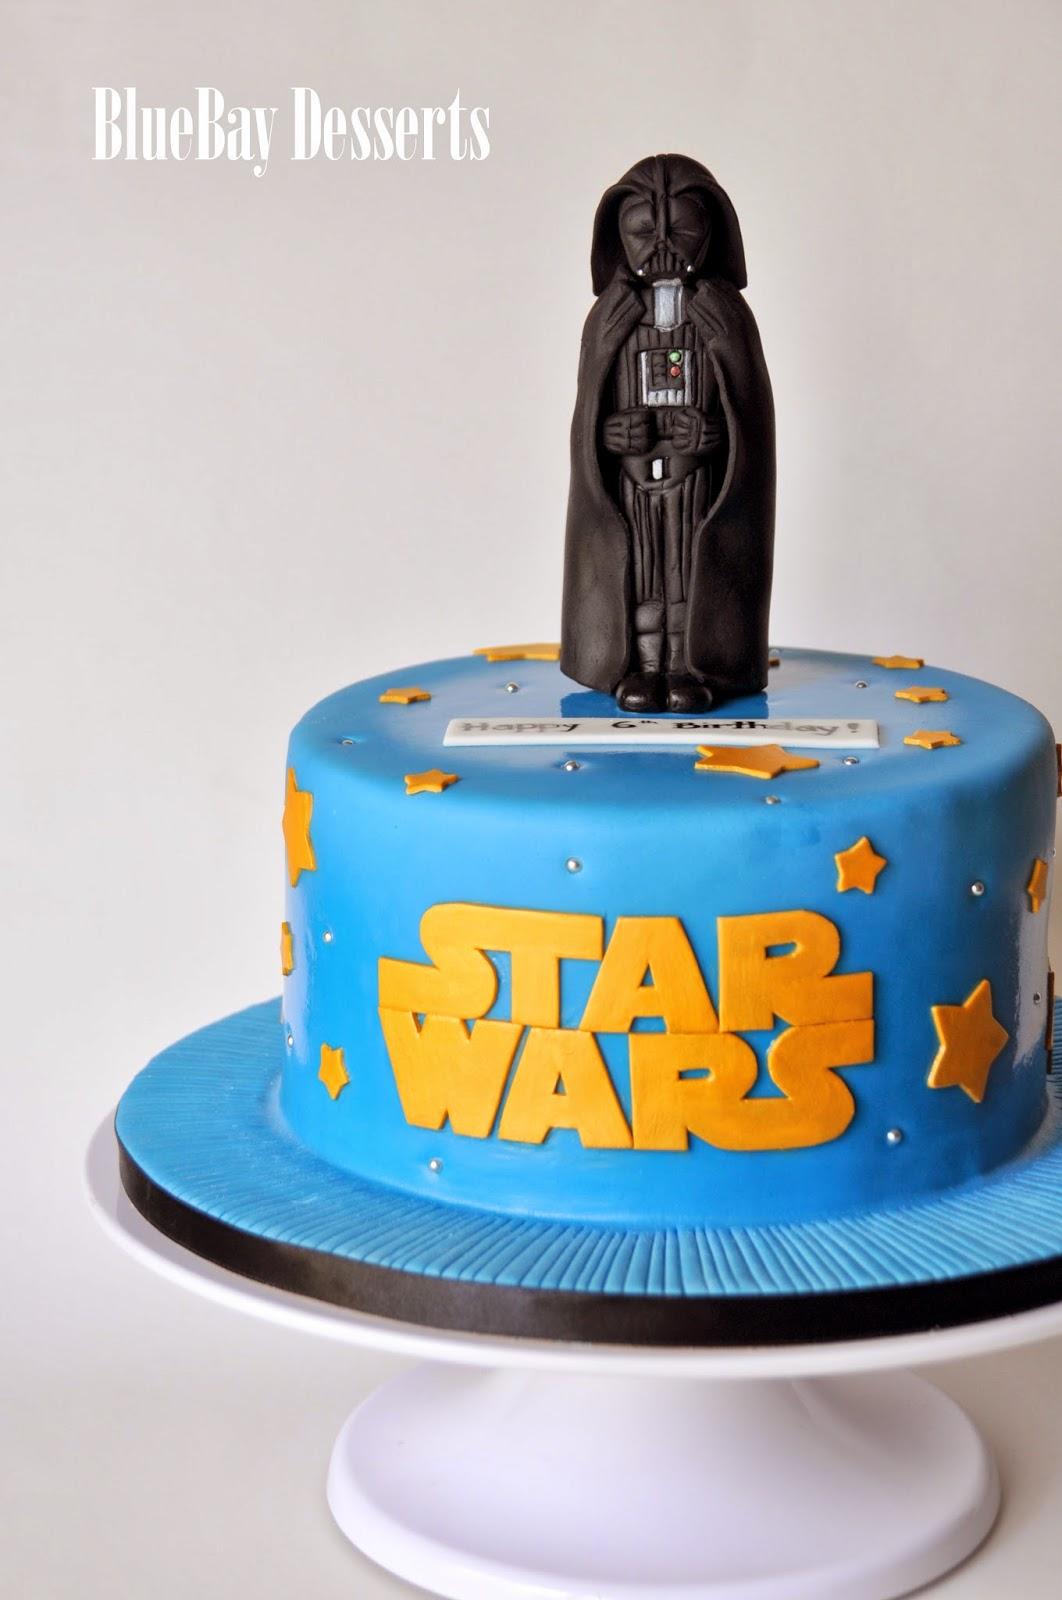 Bluebay Desserts Vancouver B C A Darth Vader Cake And